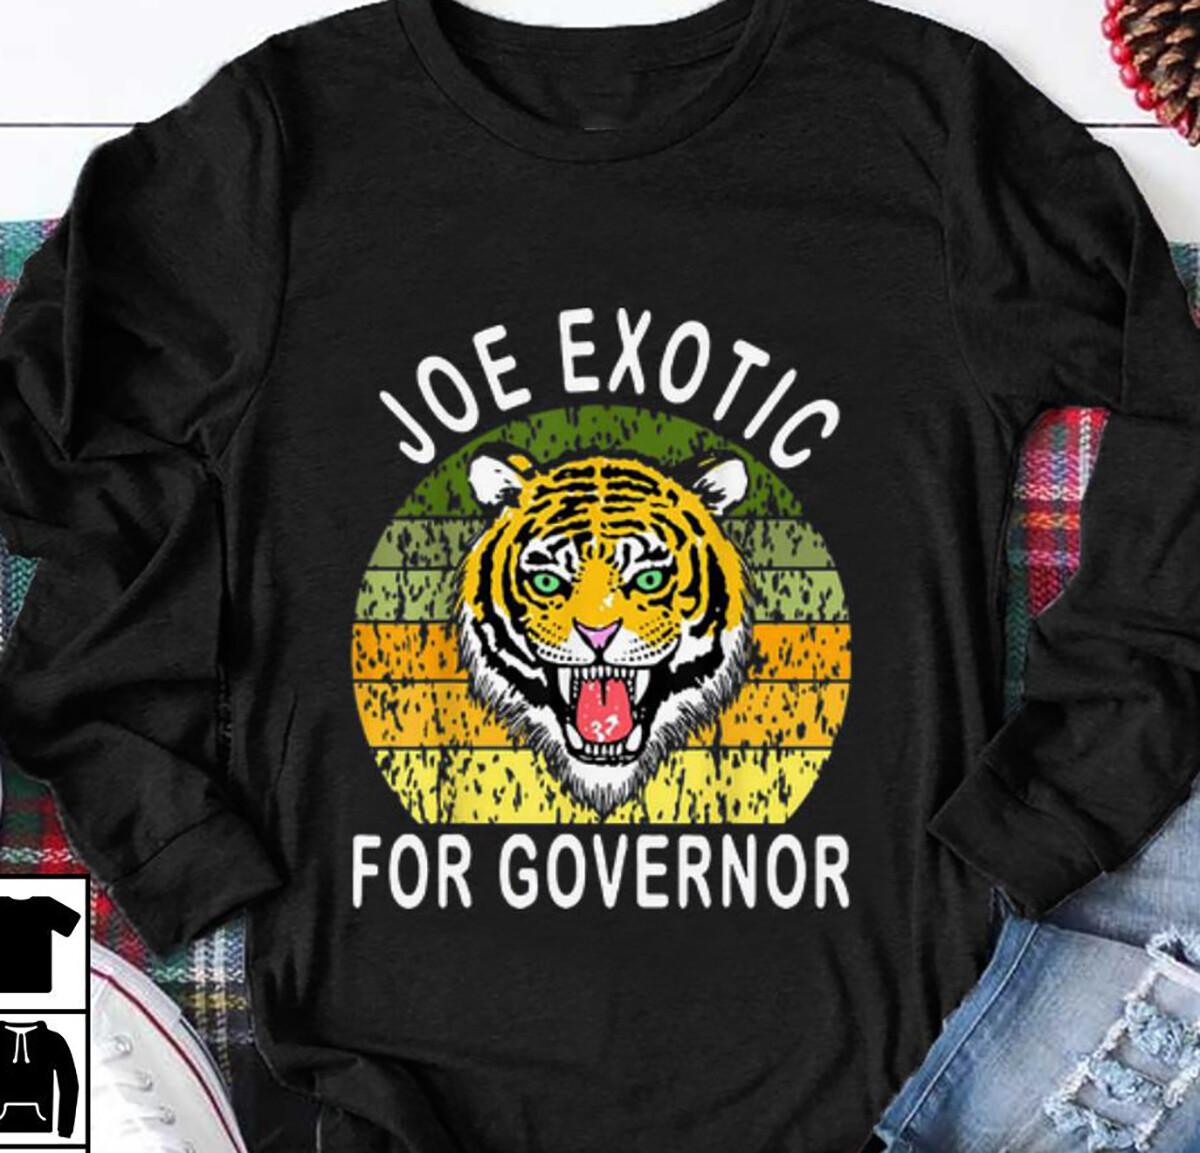 joe exotic for governor t shirt Tiger King , Free Joe Exotic Tiger King Tv Show Animal Rights Animal Trade Fan T Shirt